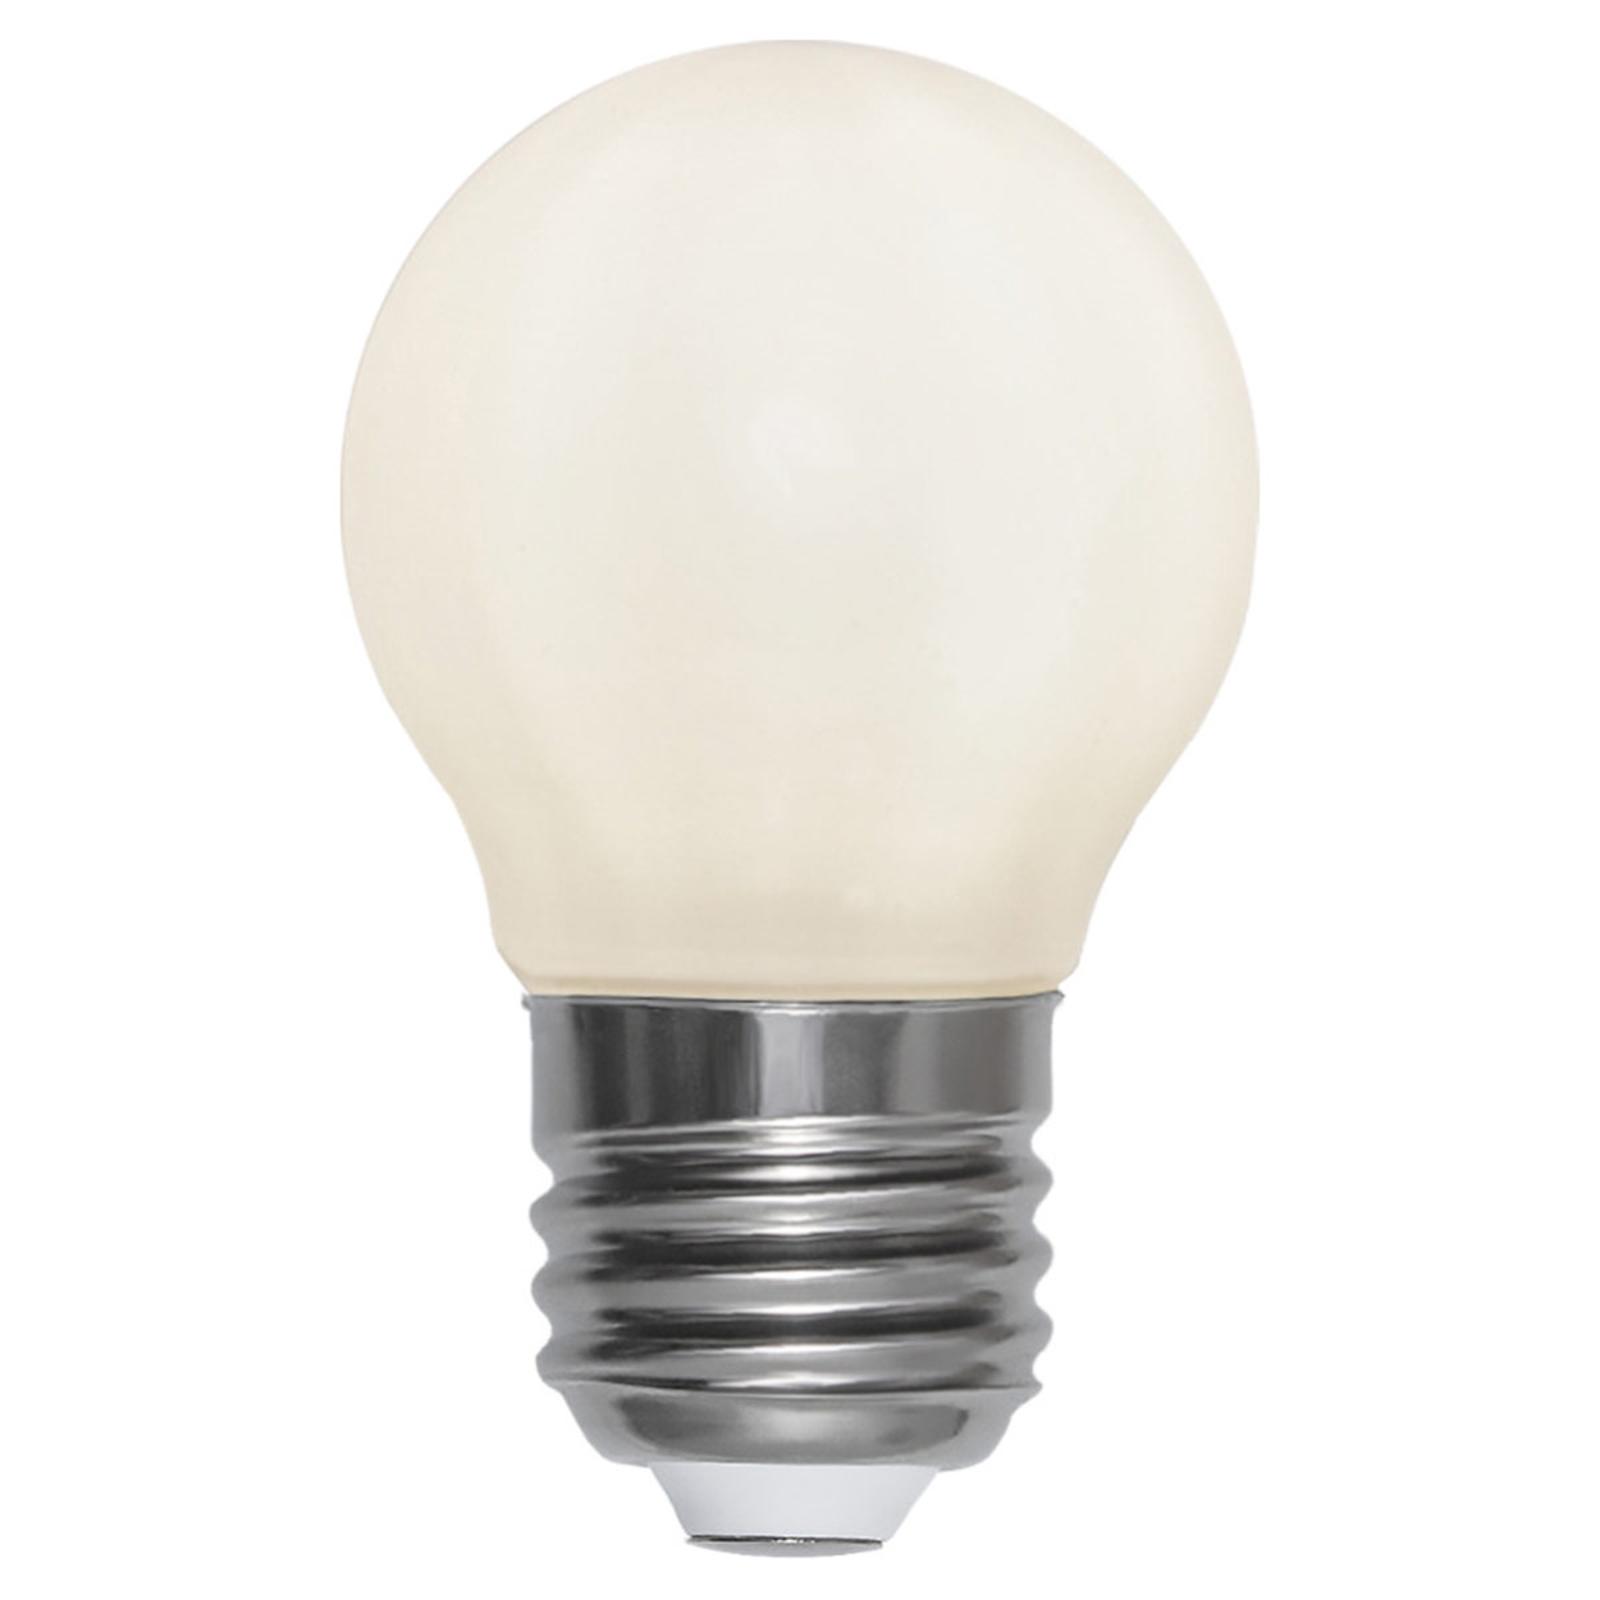 LED-Lampe E27 MiniGlobe 3W 2.700K Ra90 opal